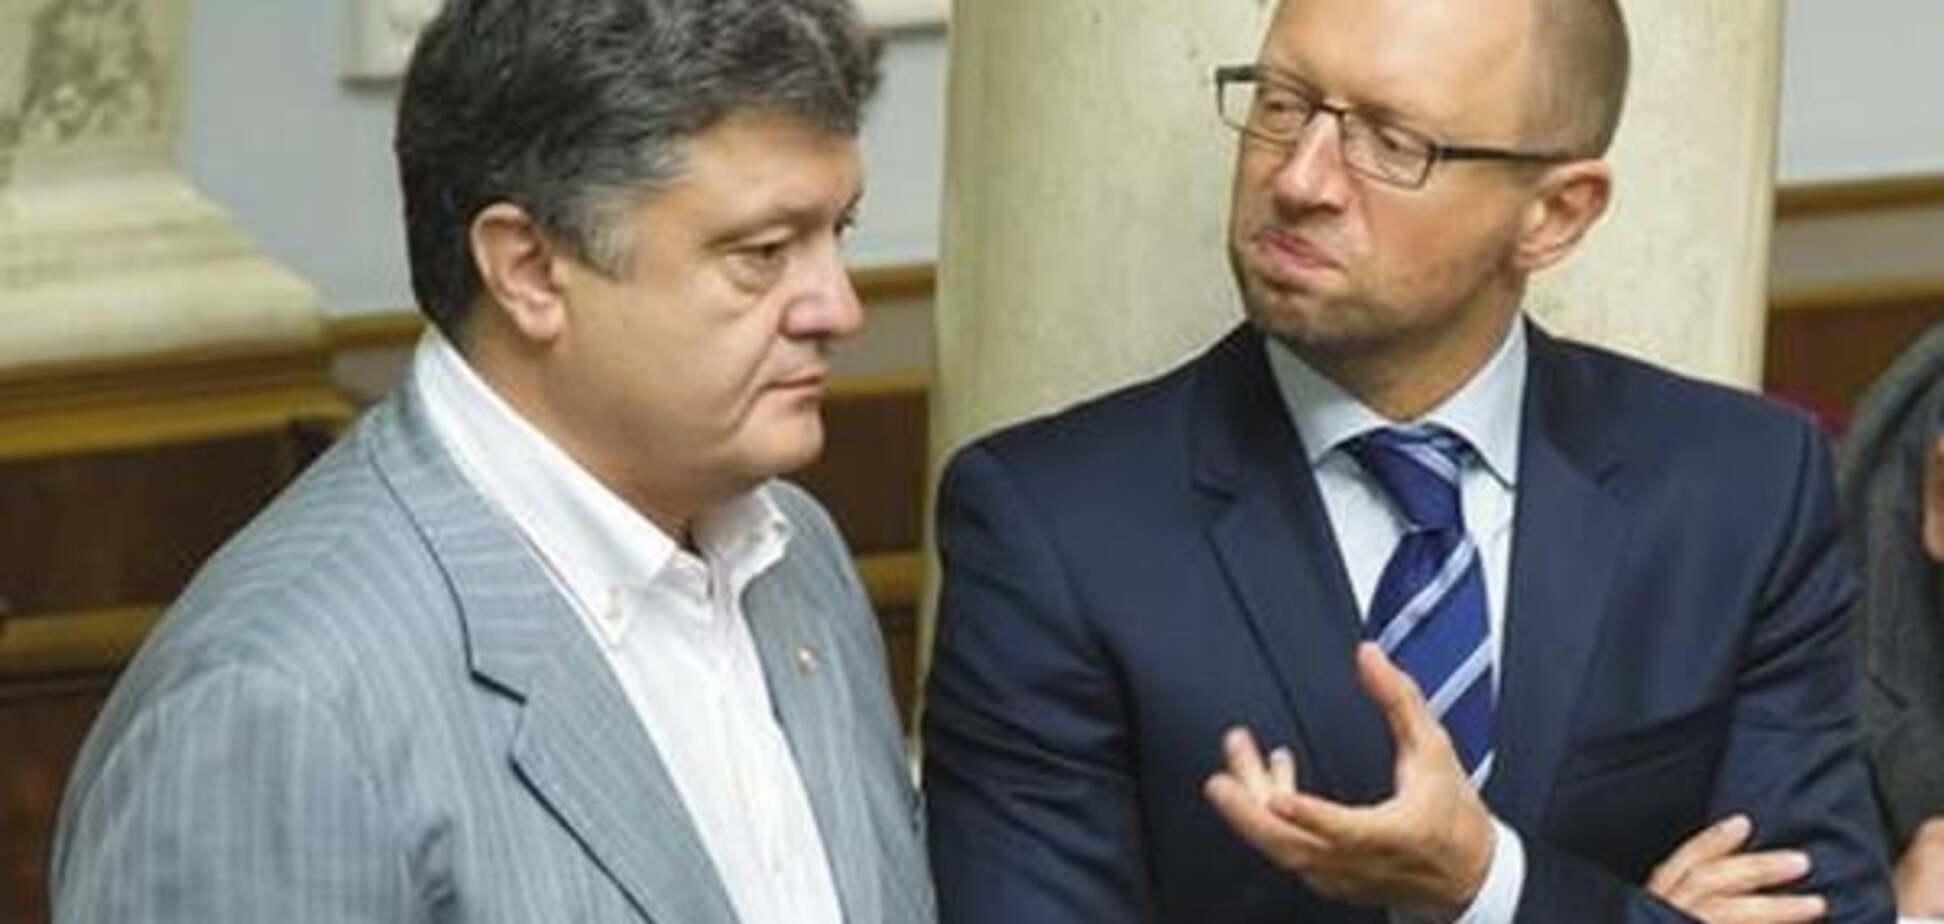 СМИ объявили о слиянии БПП, 'Народного фронта' и УДАРа в суперпартию